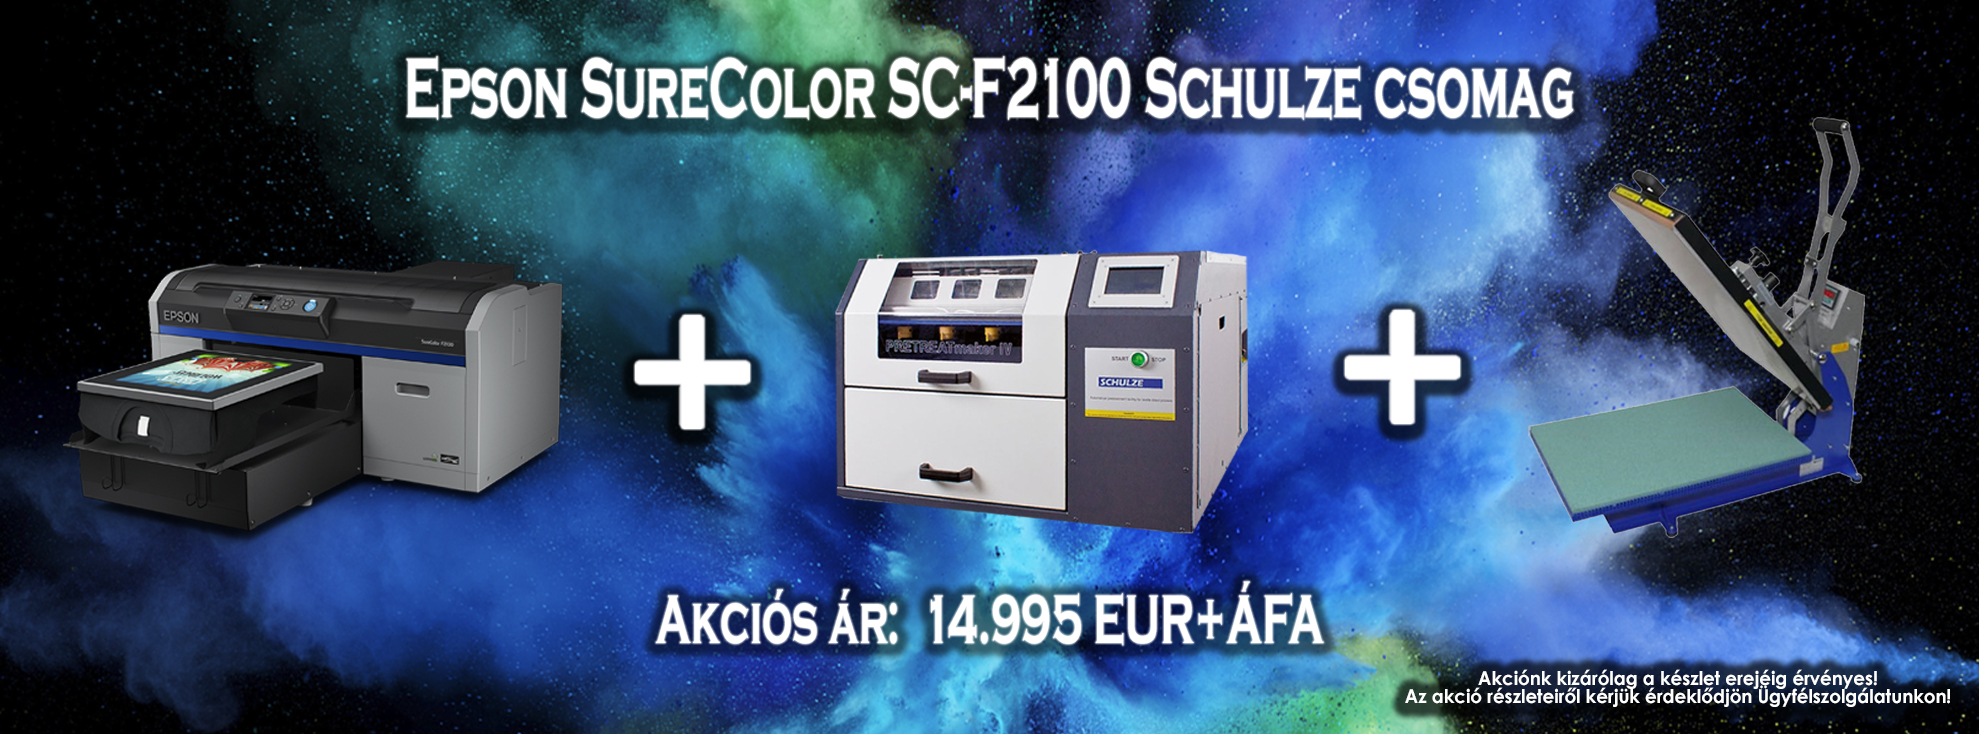 Epson SureColor SC-F2100 Schulze csomag